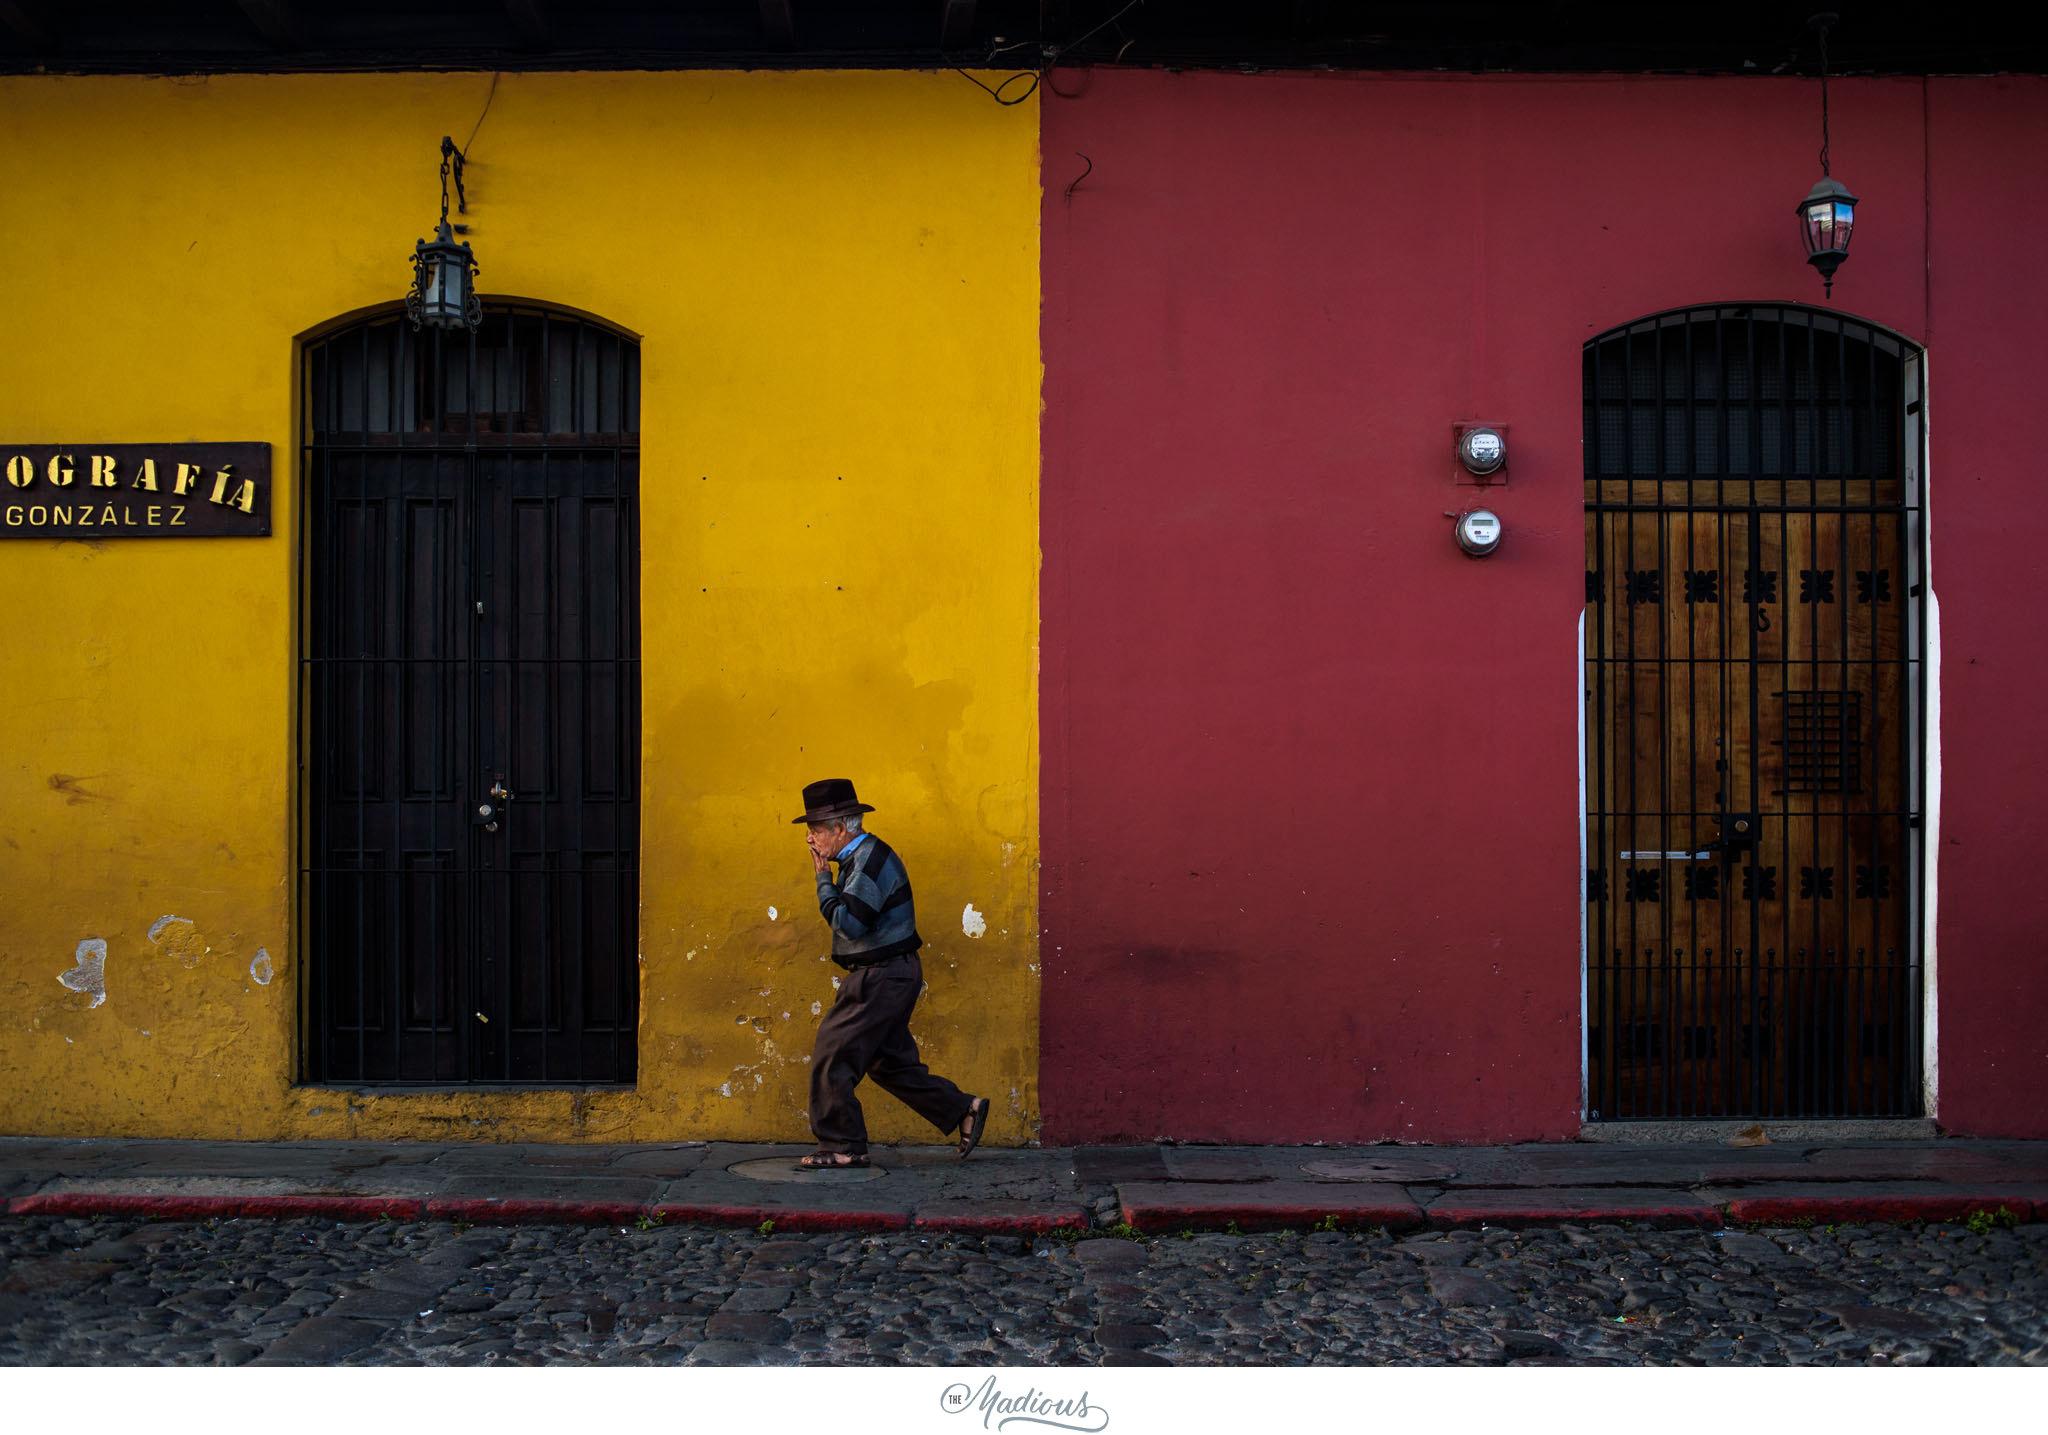 Leigh_Rob_Antigua_Guatemala_Santa_Clara_Destination_Wedding_03.JPG